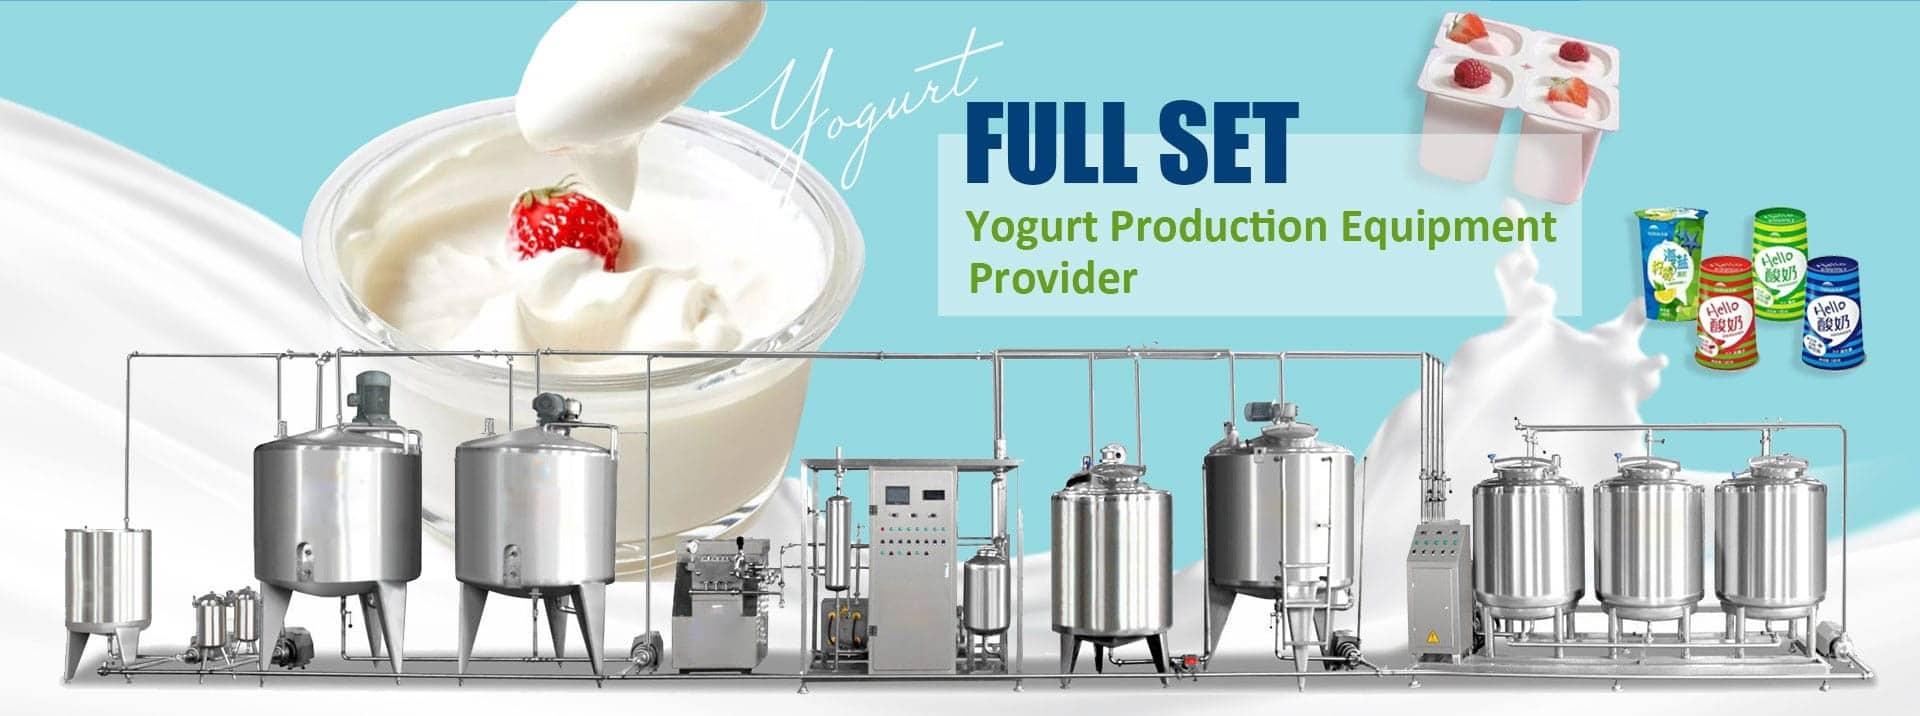 Full set of the yogurt production line